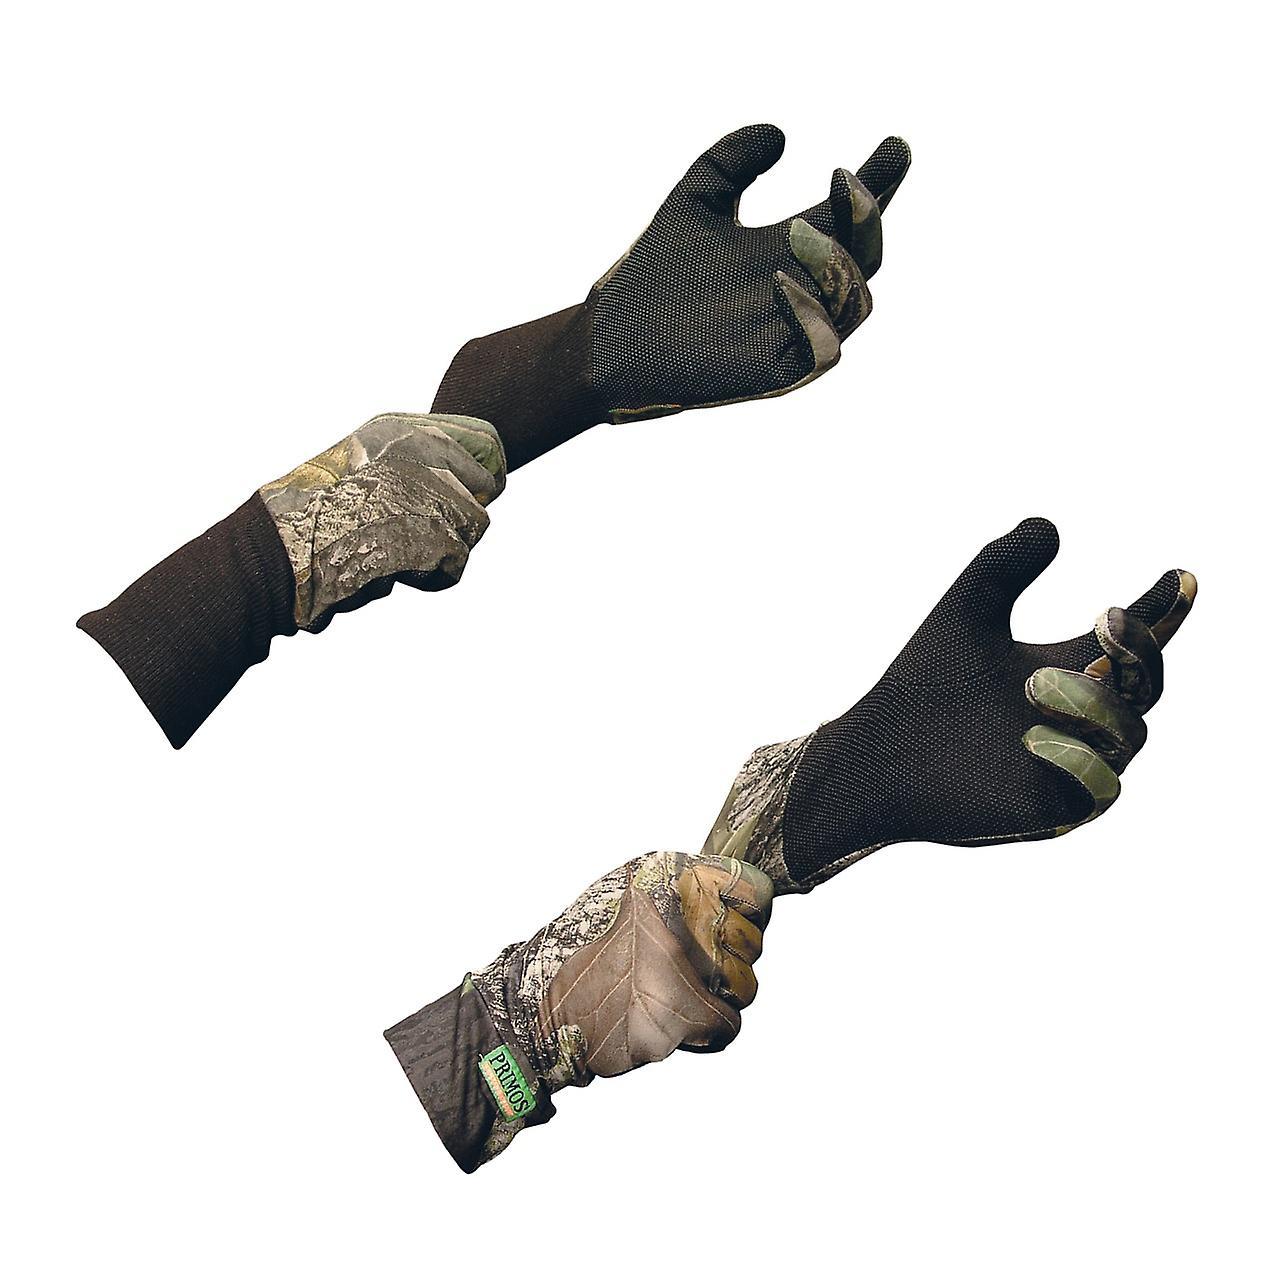 PRIMOS Stealth Camo Handschuhe sicher Griff Zerfall Tarnung Jagd schießen